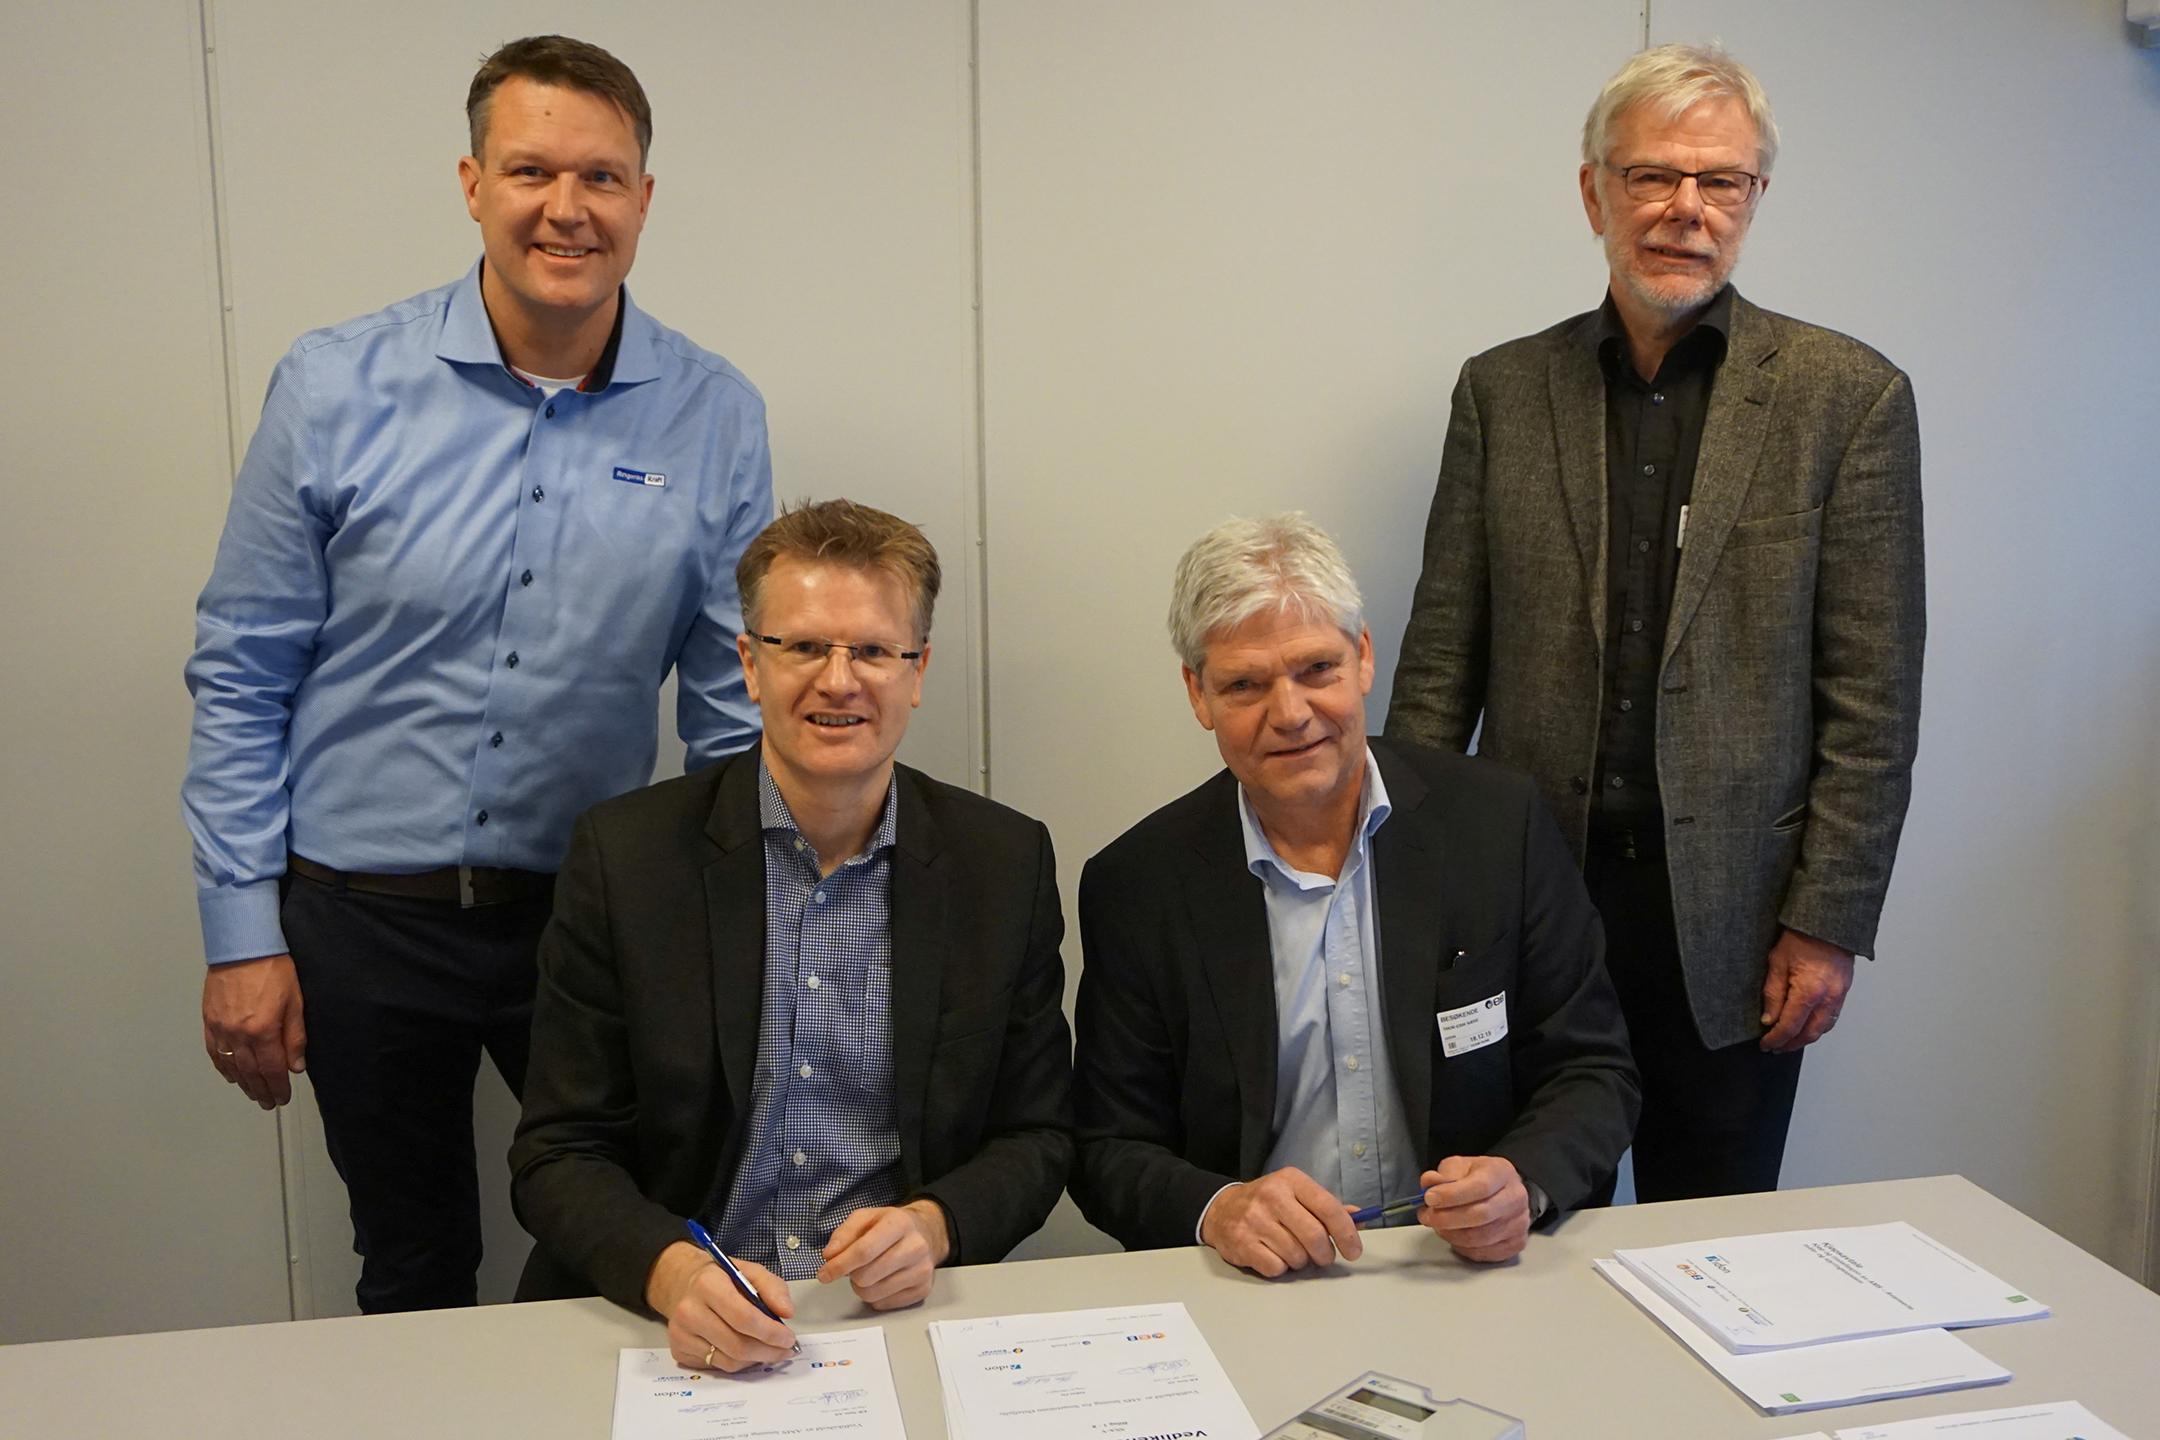 from left: Steffen Fagerås, Service director of Ringeriks-Kraft Service, Tore Morten Wetterhus, Managing Director of EB Nett, Thor-Erik Næss, Managing director of Aidon in Norway and Lars Øivind Andresen, Managing director of Øvre Eiker Nett